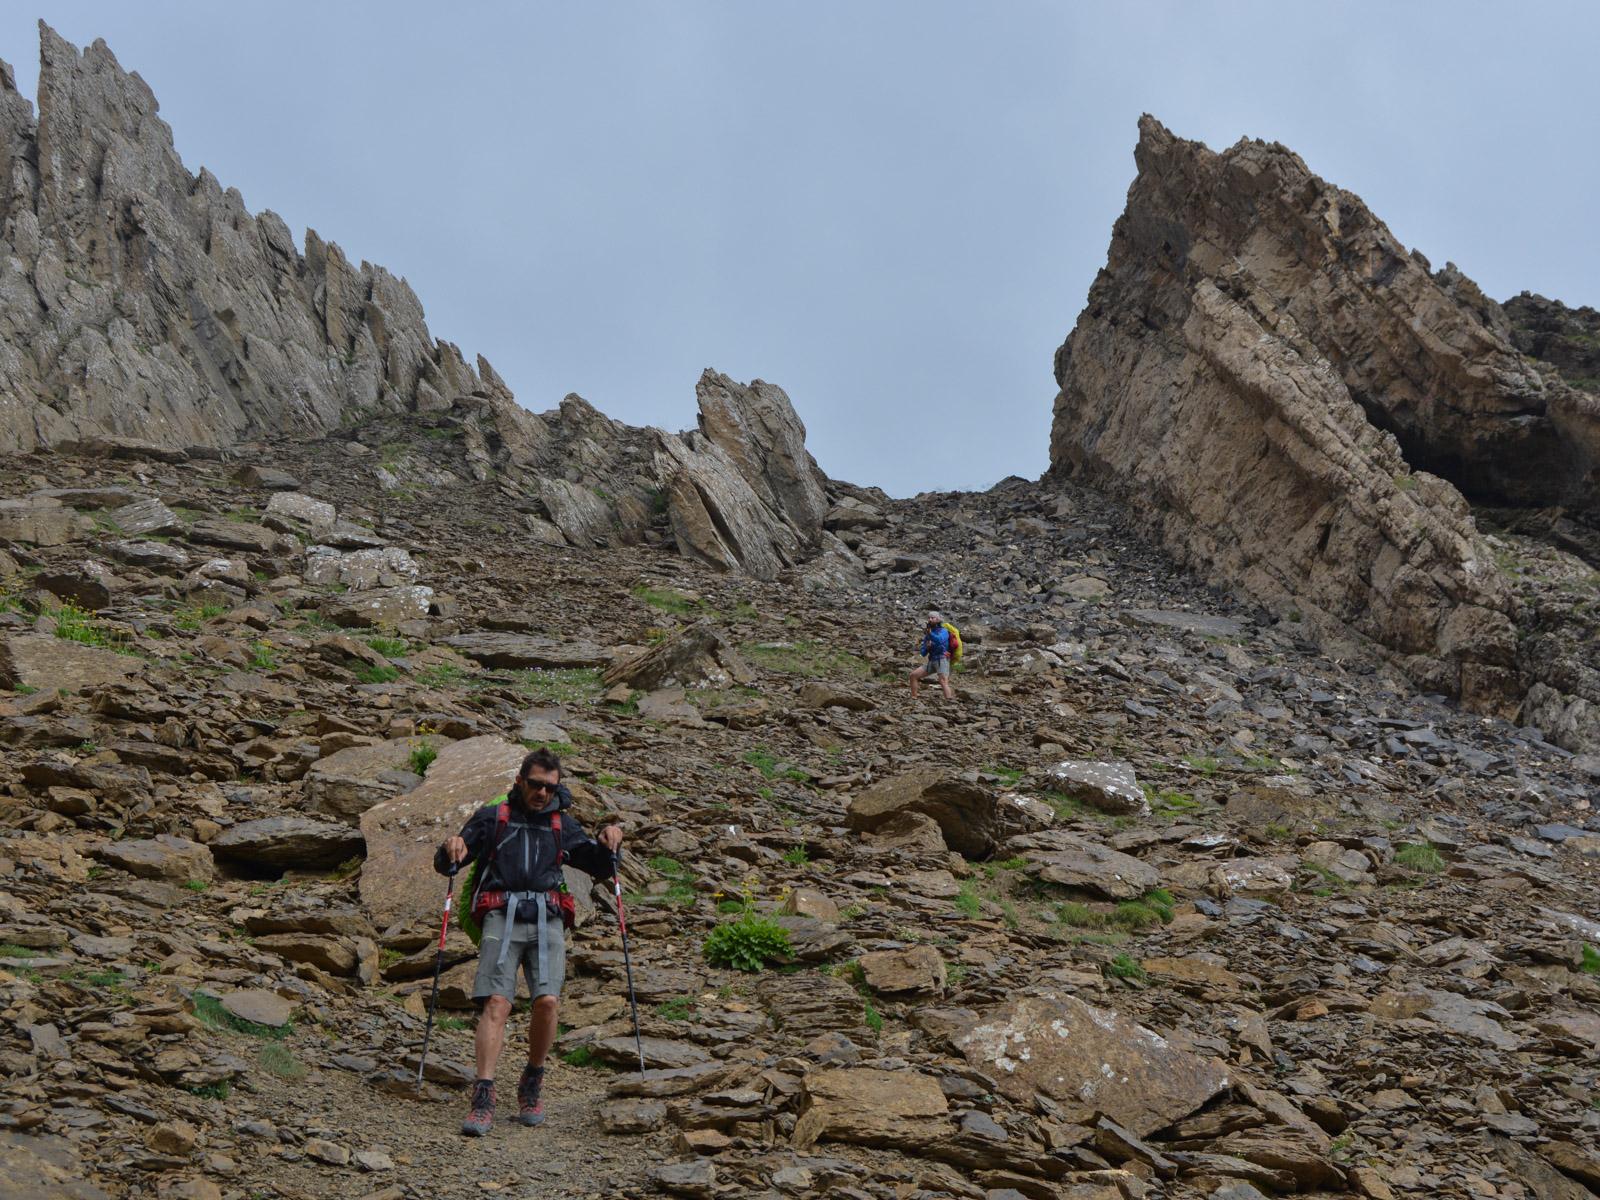 Monte Perdido et Faja de las Flores, Jour 3, Ordesa, Aragon, Espagne 29